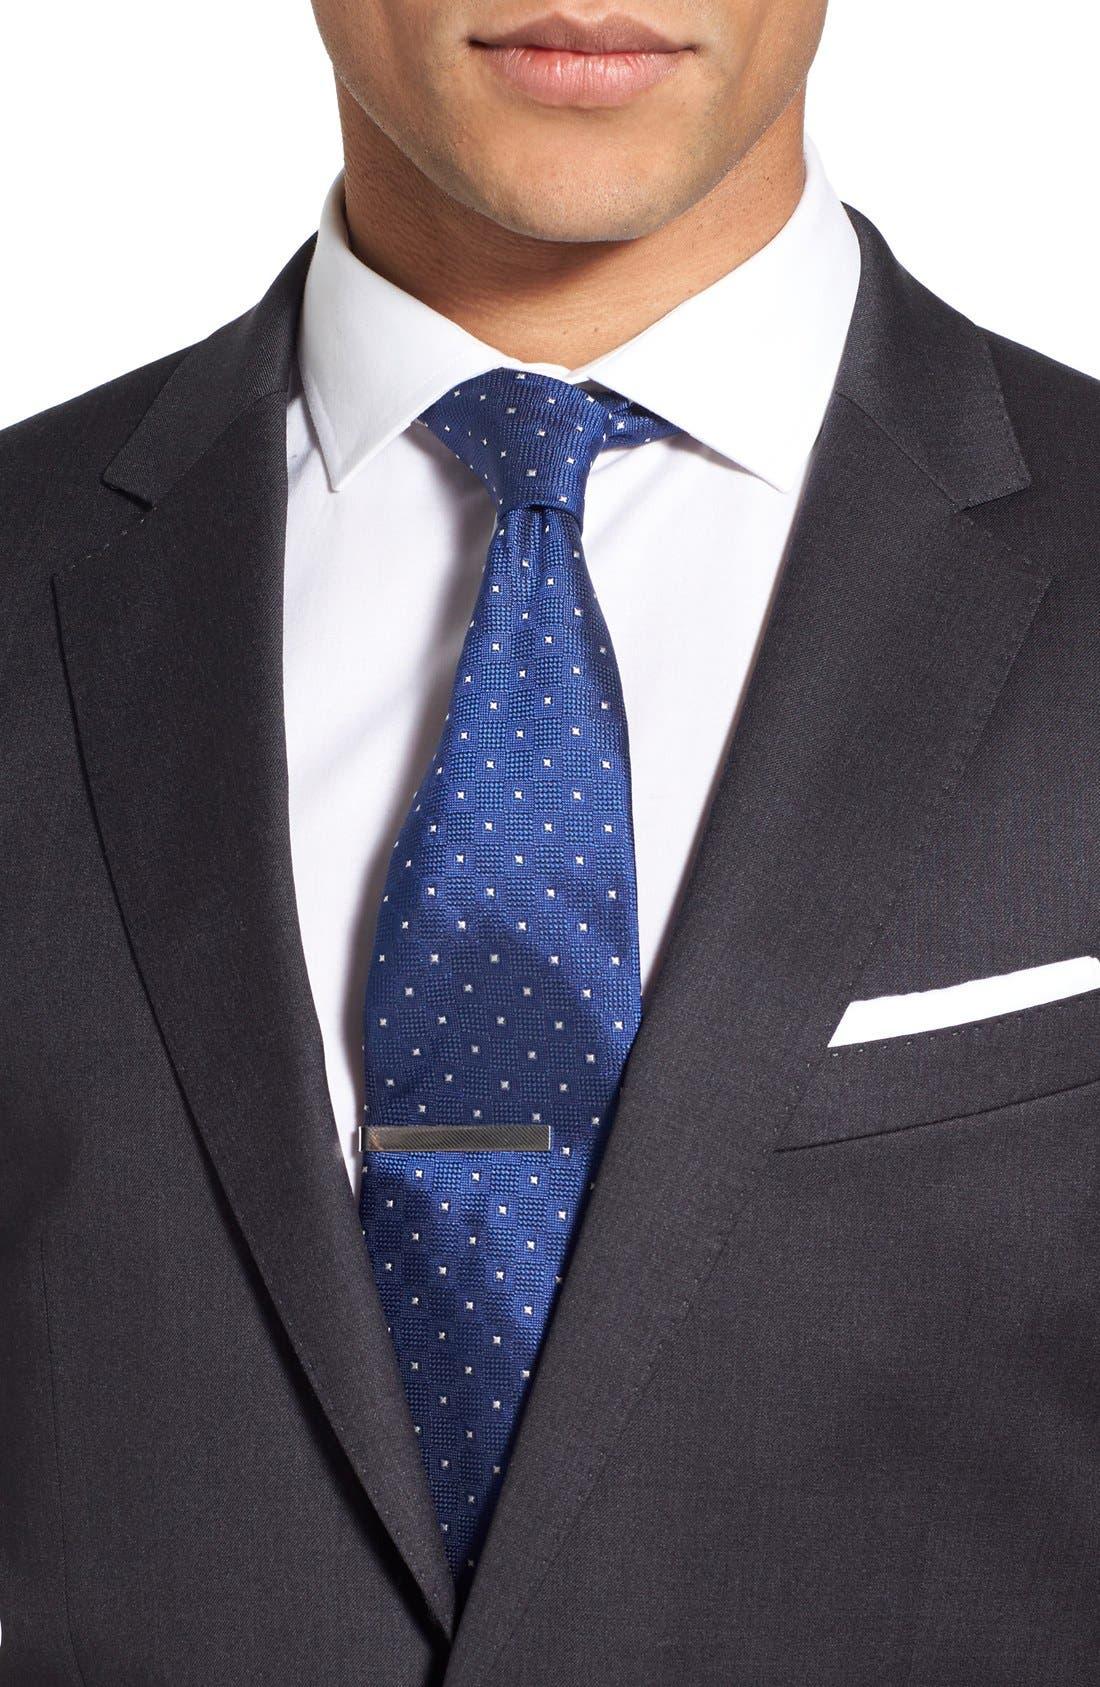 'Ryan/Win' Extra Trim Fit Solid Wool Suit,                             Alternate thumbnail 4, color,                             Dark Grey